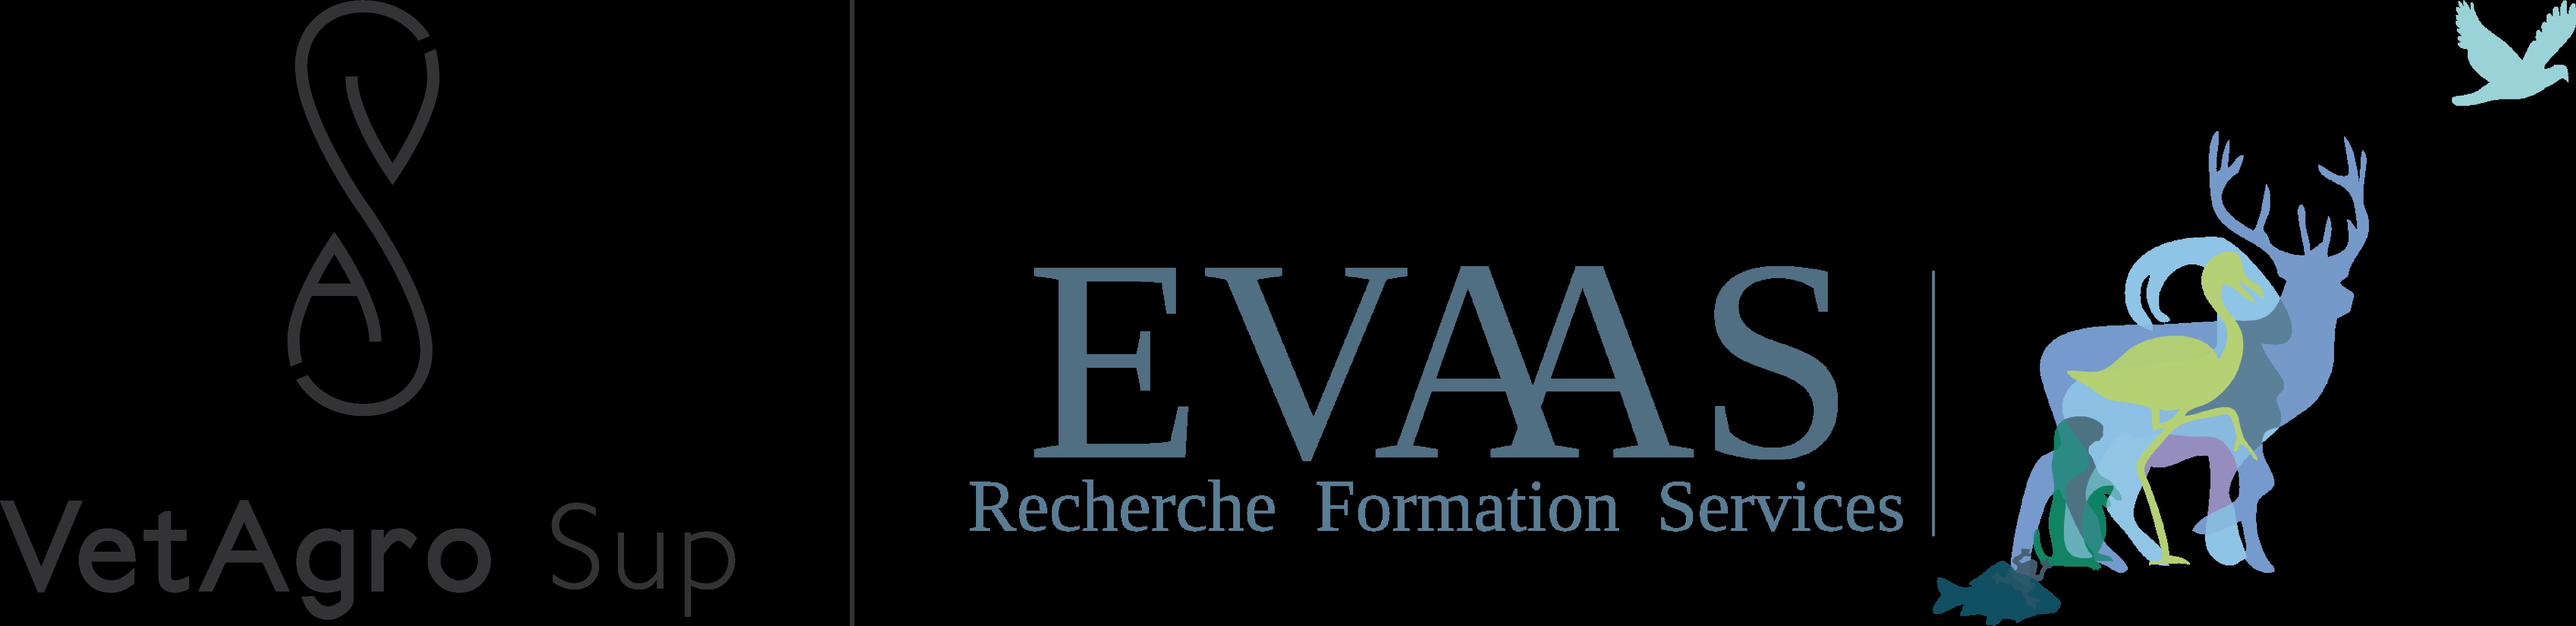 EVAAS